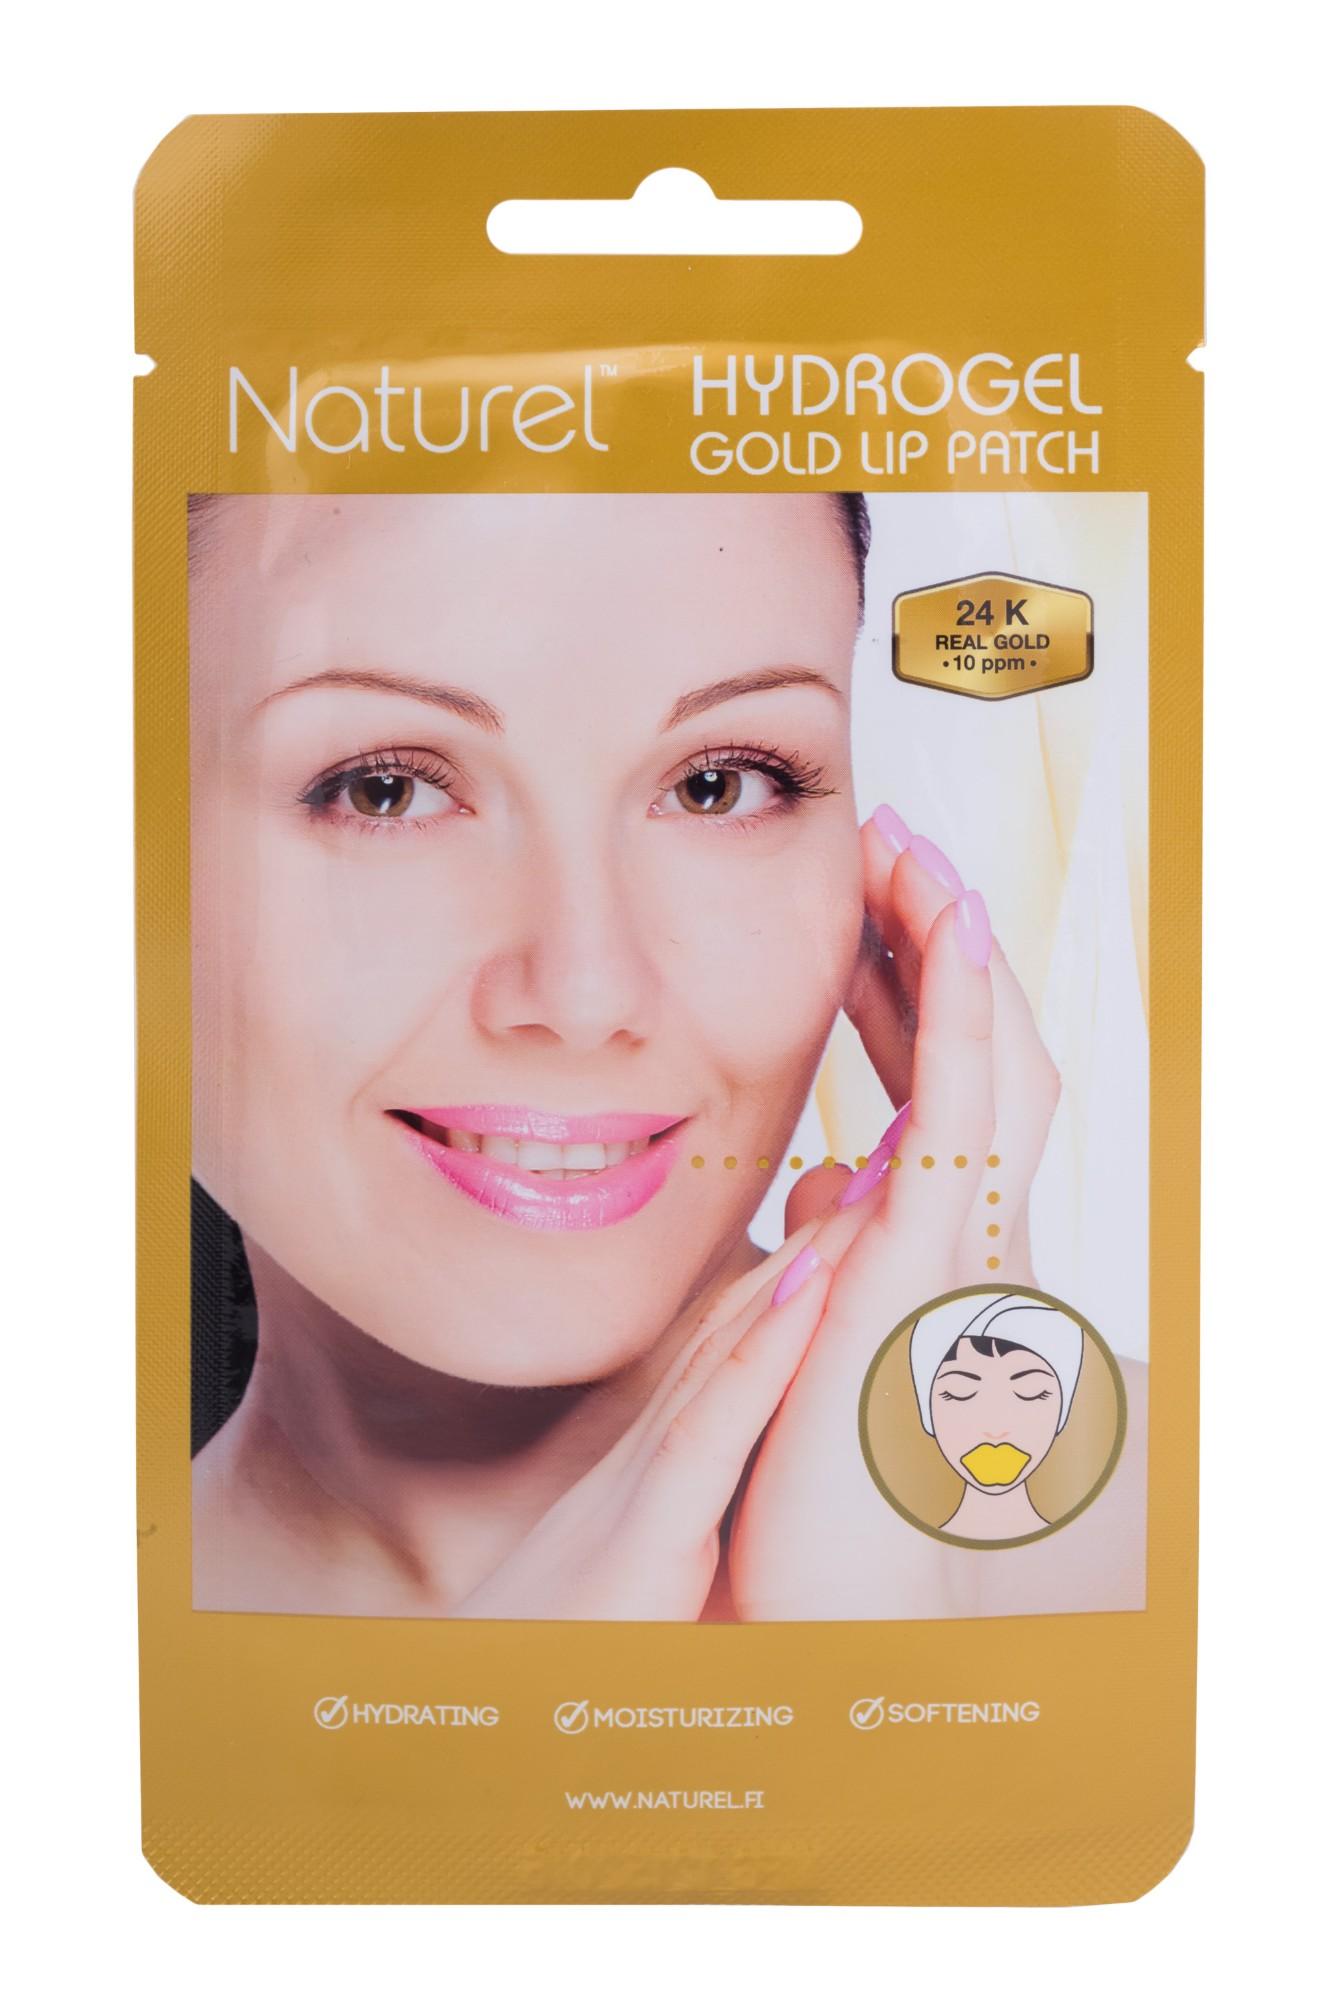 Drėkinamoji hidrogelio lūpų kaukė Naturel su 24K auksu, 2,5g